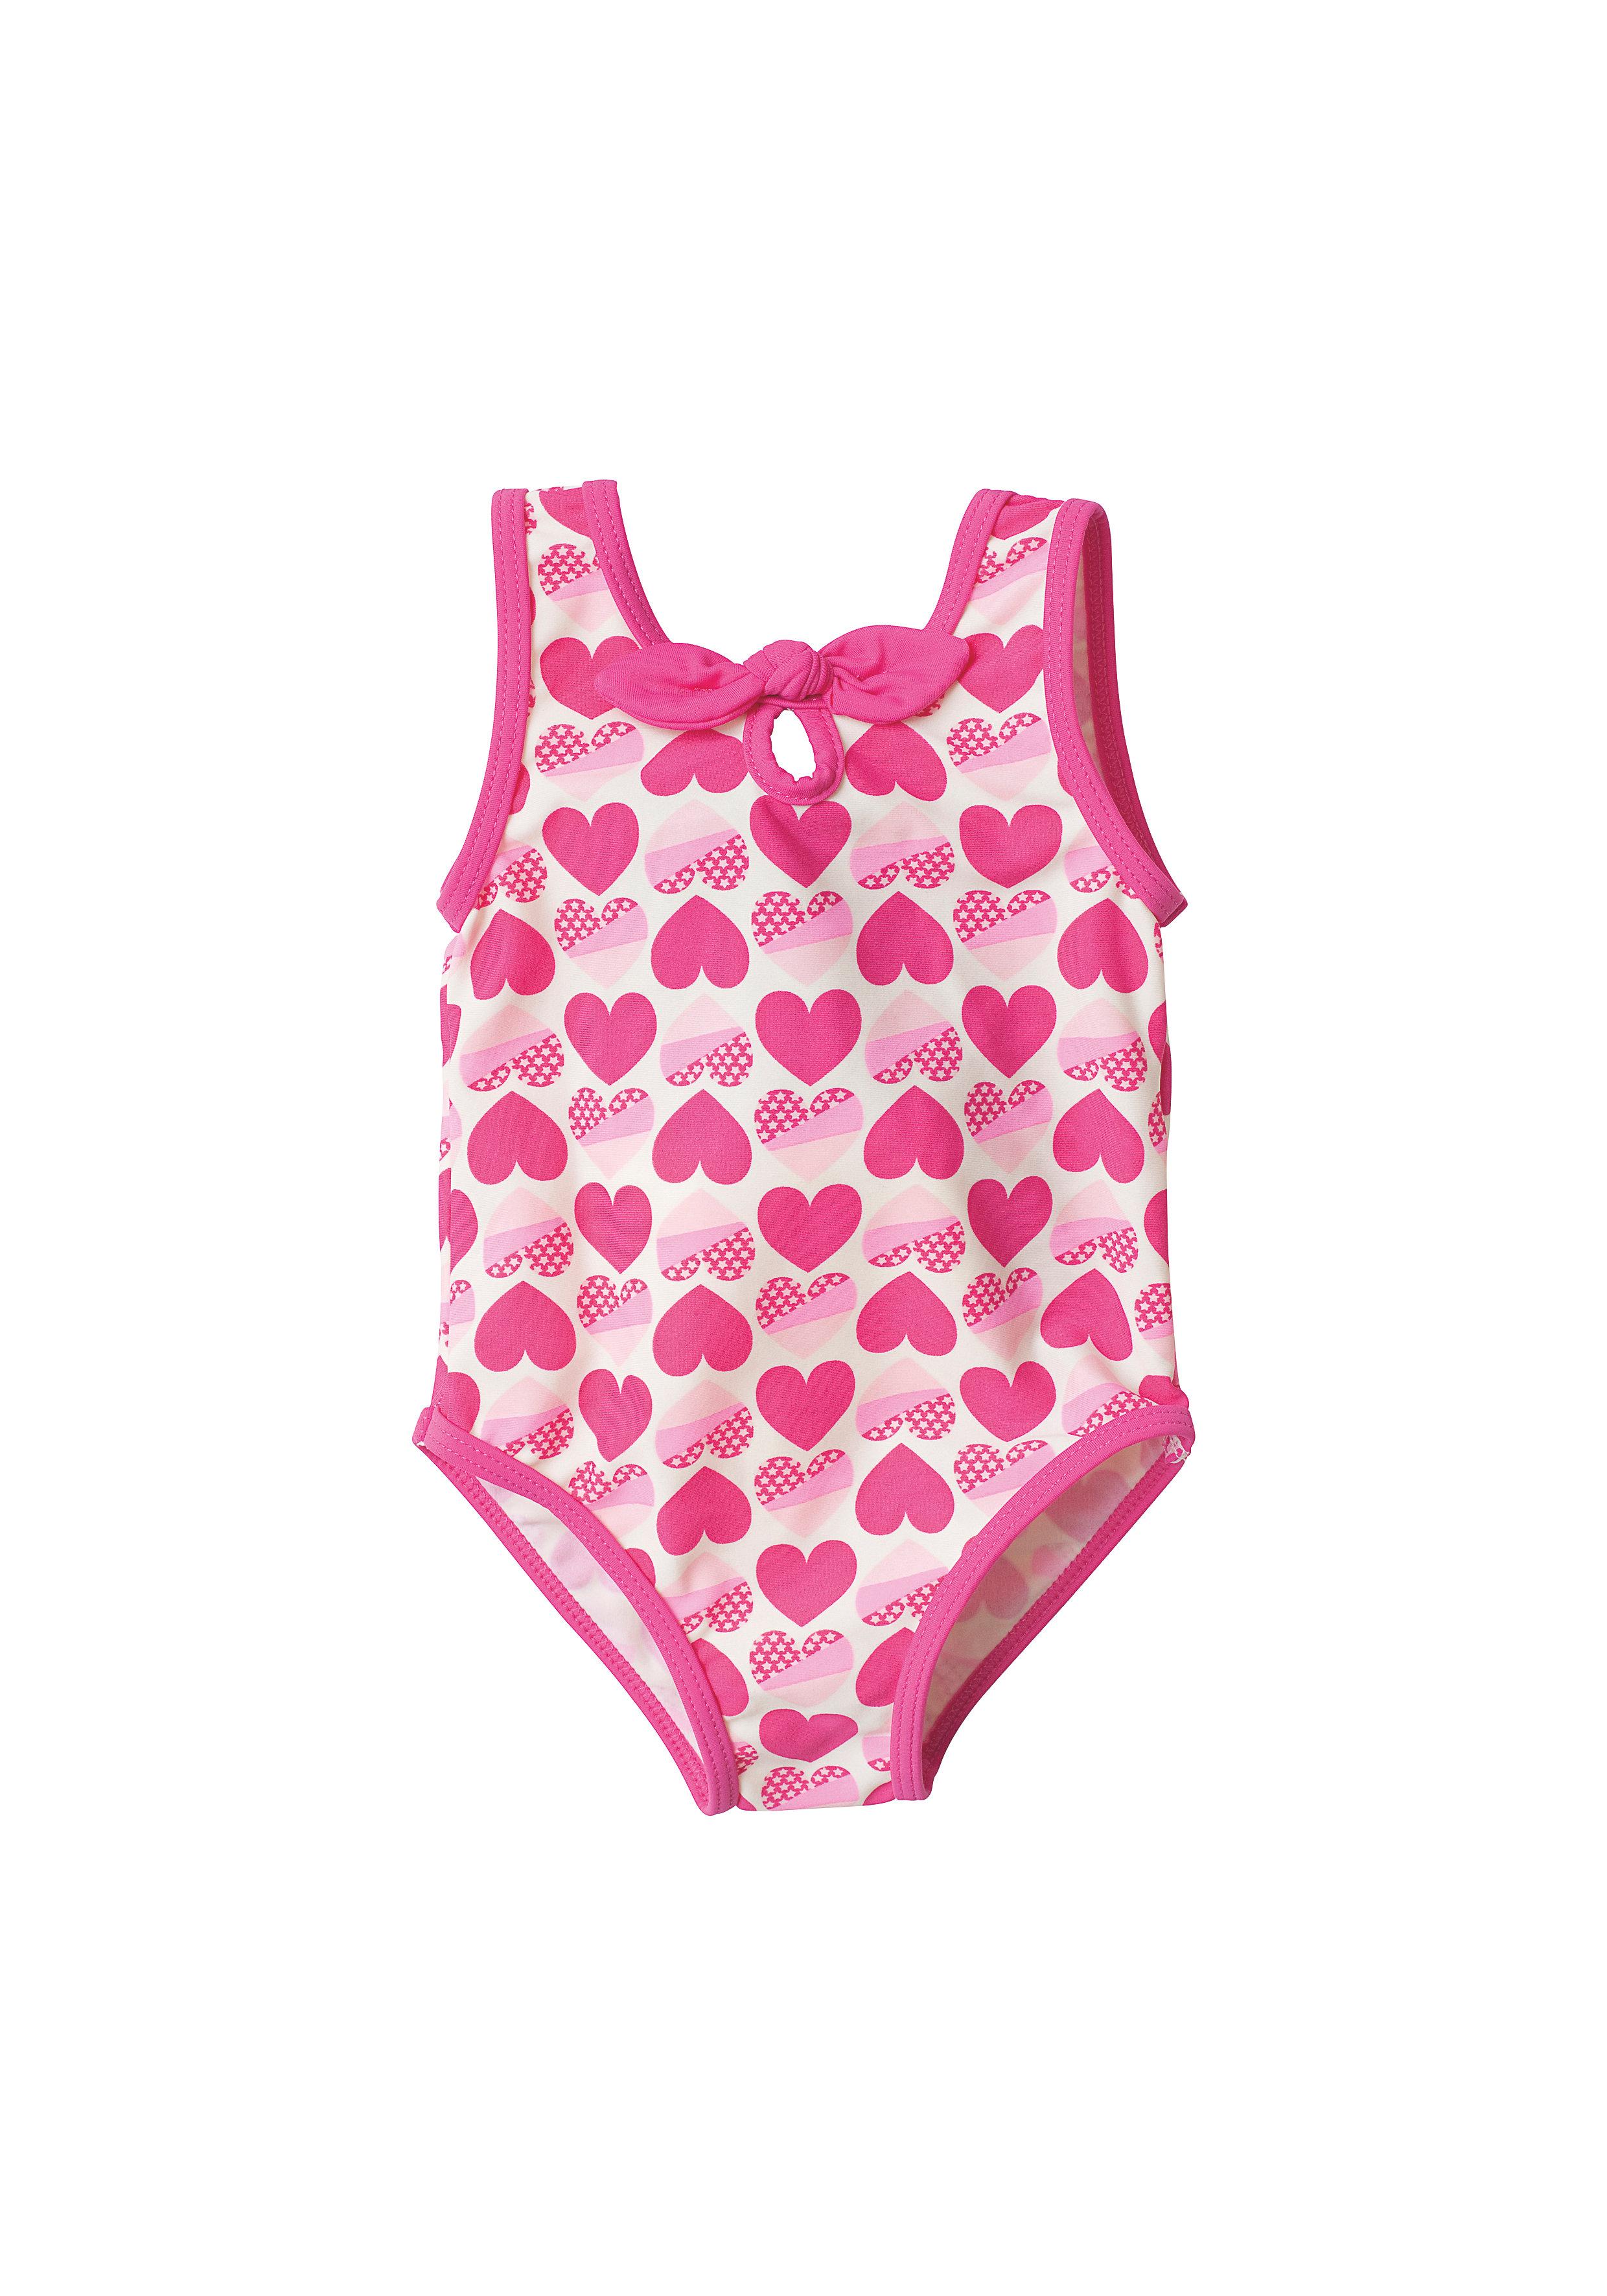 Mothercare | Girls Sleeveless Swimsuit Heart Print - Pink